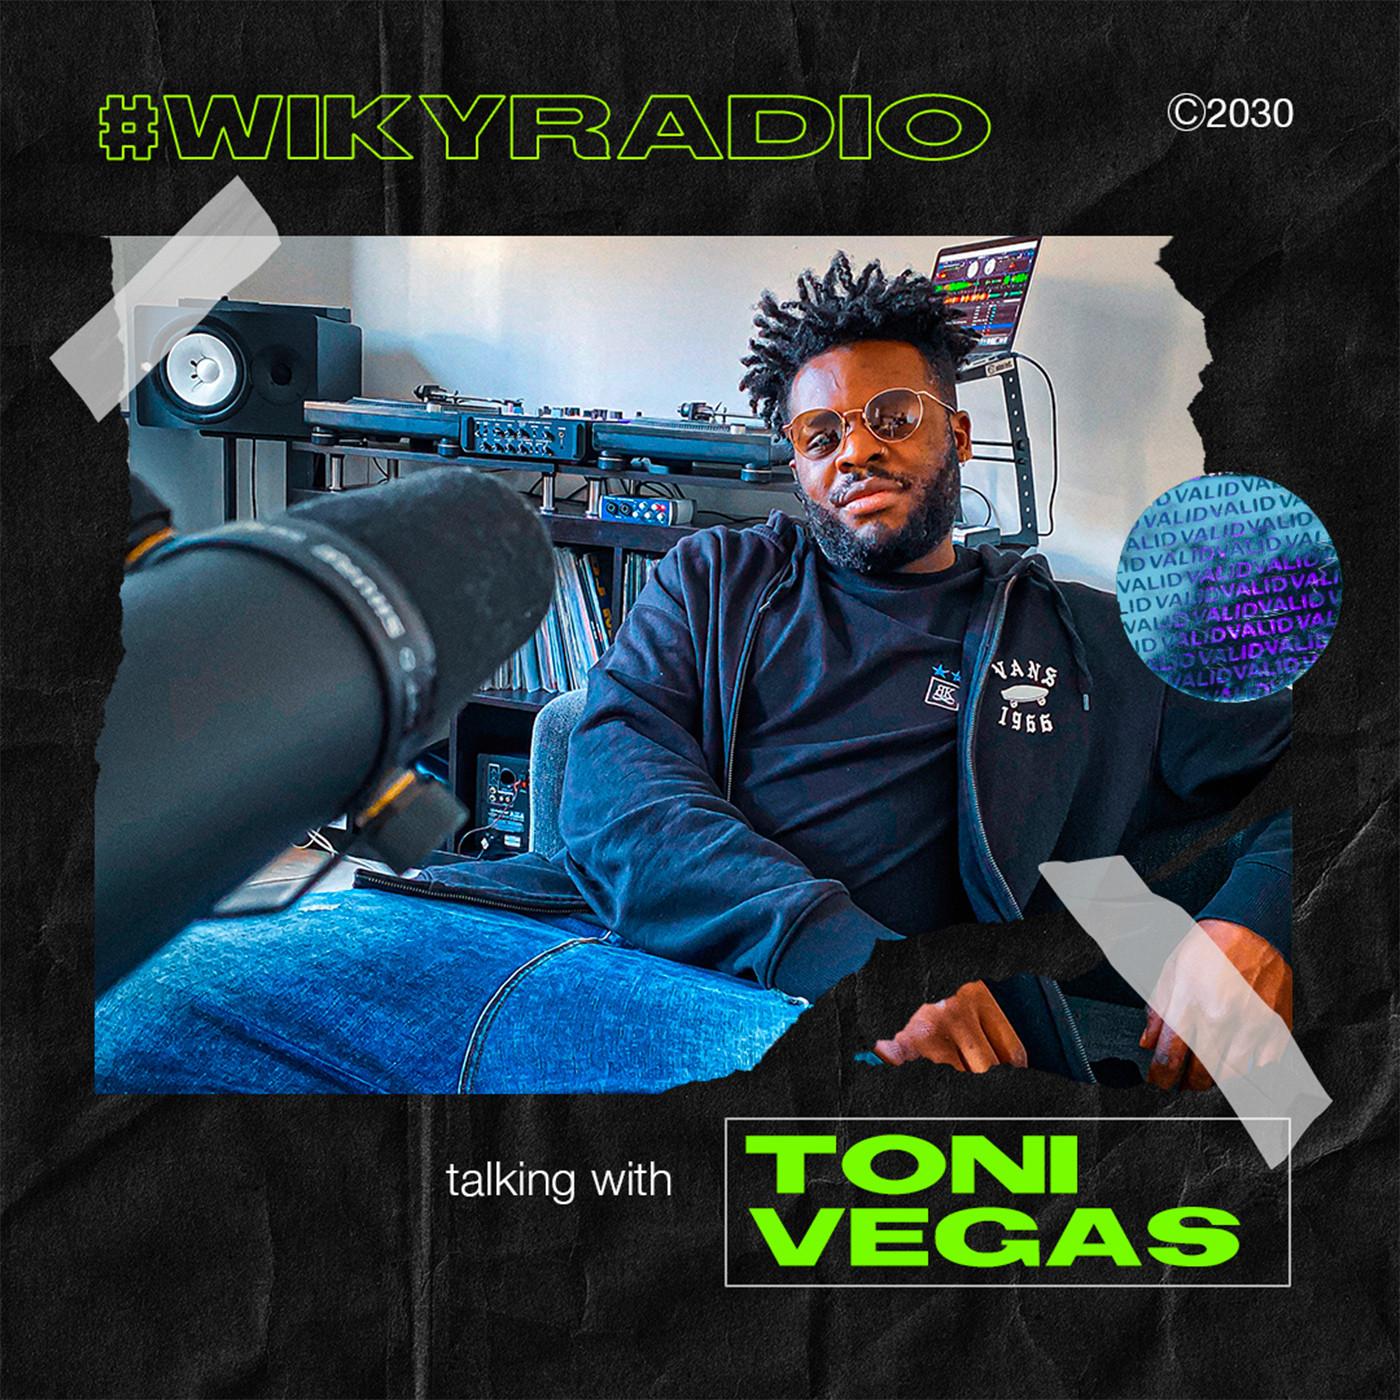 WIKY RADIO - TALKING WITH TONI VEGAS